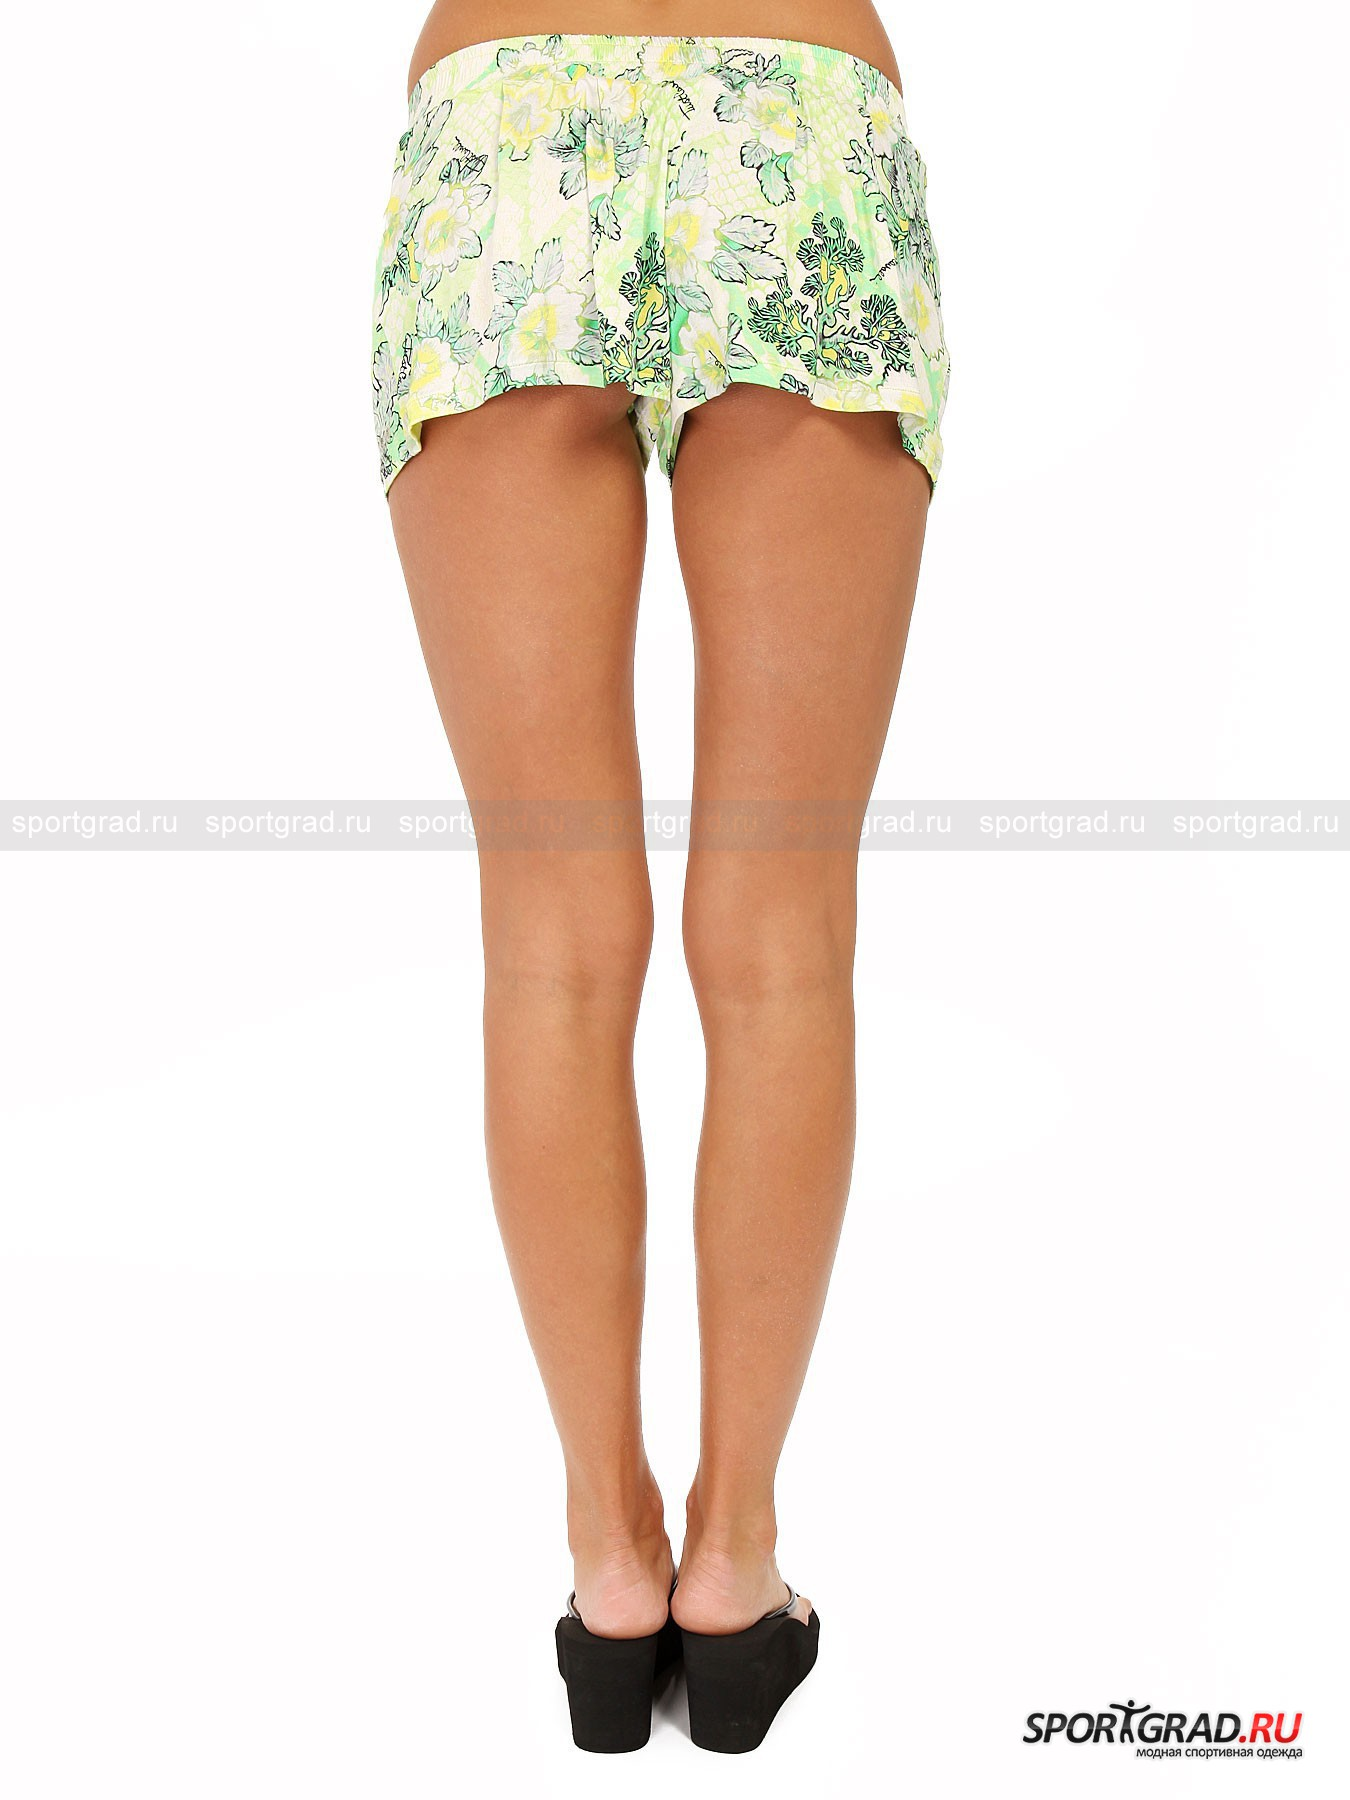 Шорты женcкие JUST CAVALLI Beachwear от Спортград